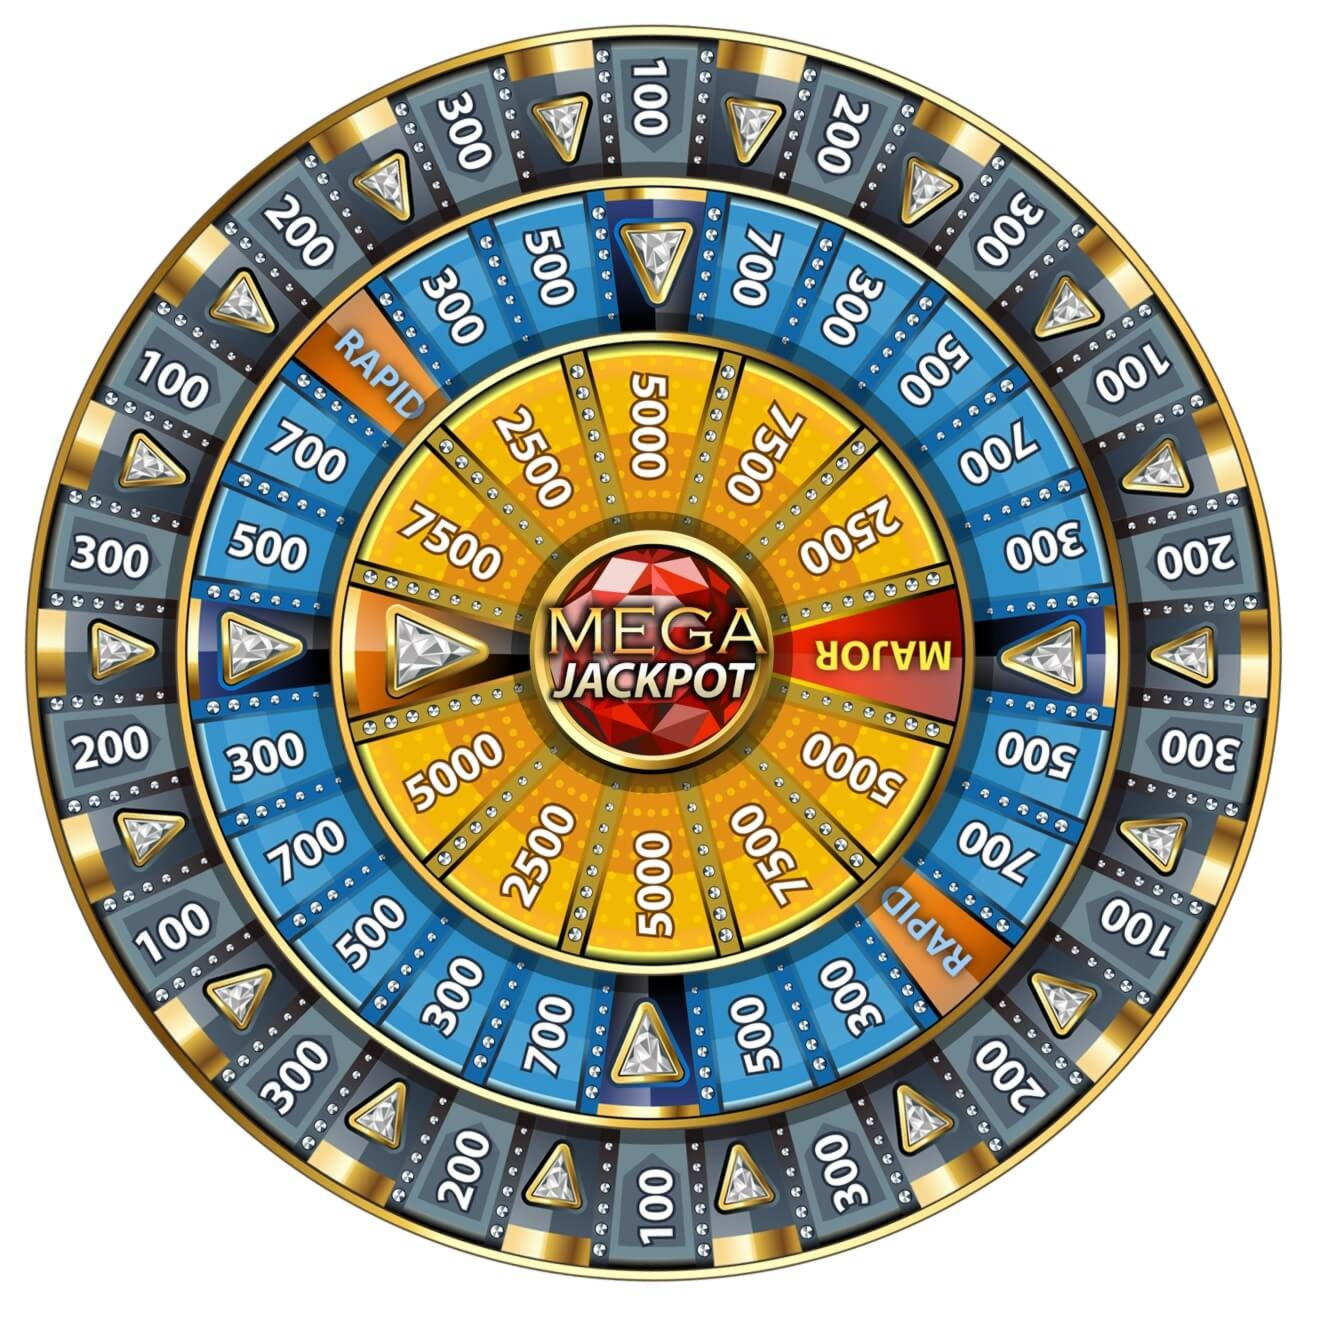 Eur 520 Daily freeroll slot tournament at Speedy Casino